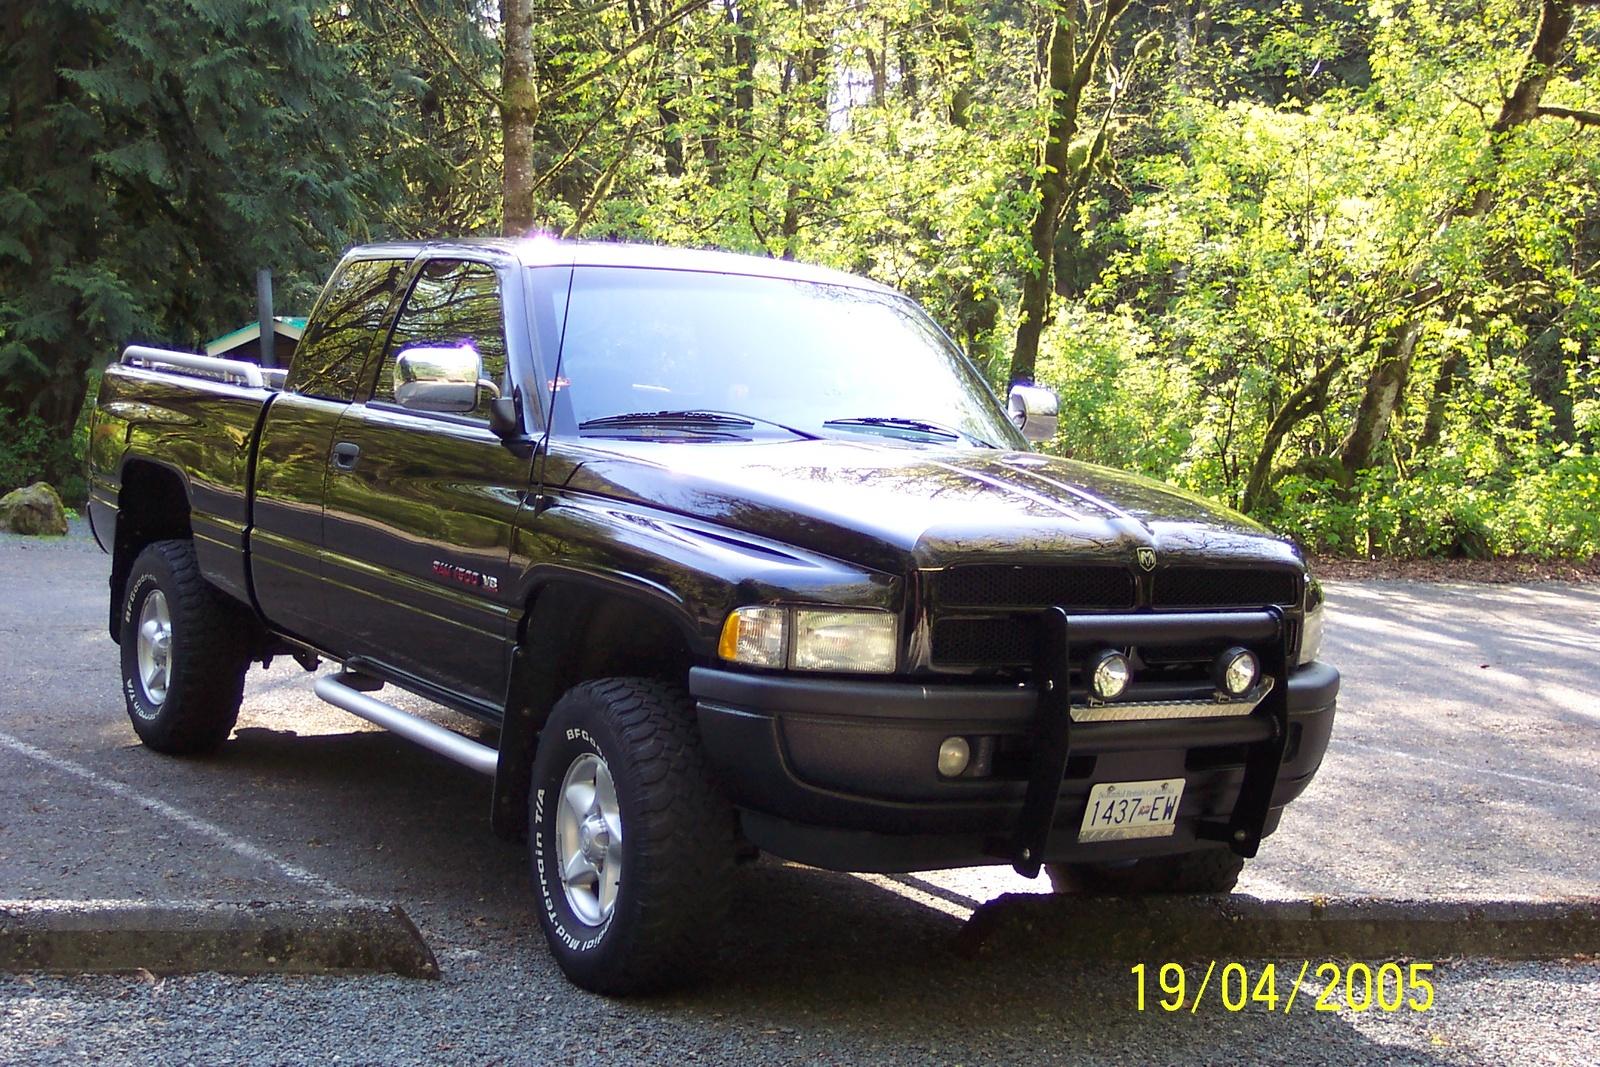 1996 dodge ram pickup 1500 exterior pictures cargurus. Black Bedroom Furniture Sets. Home Design Ideas